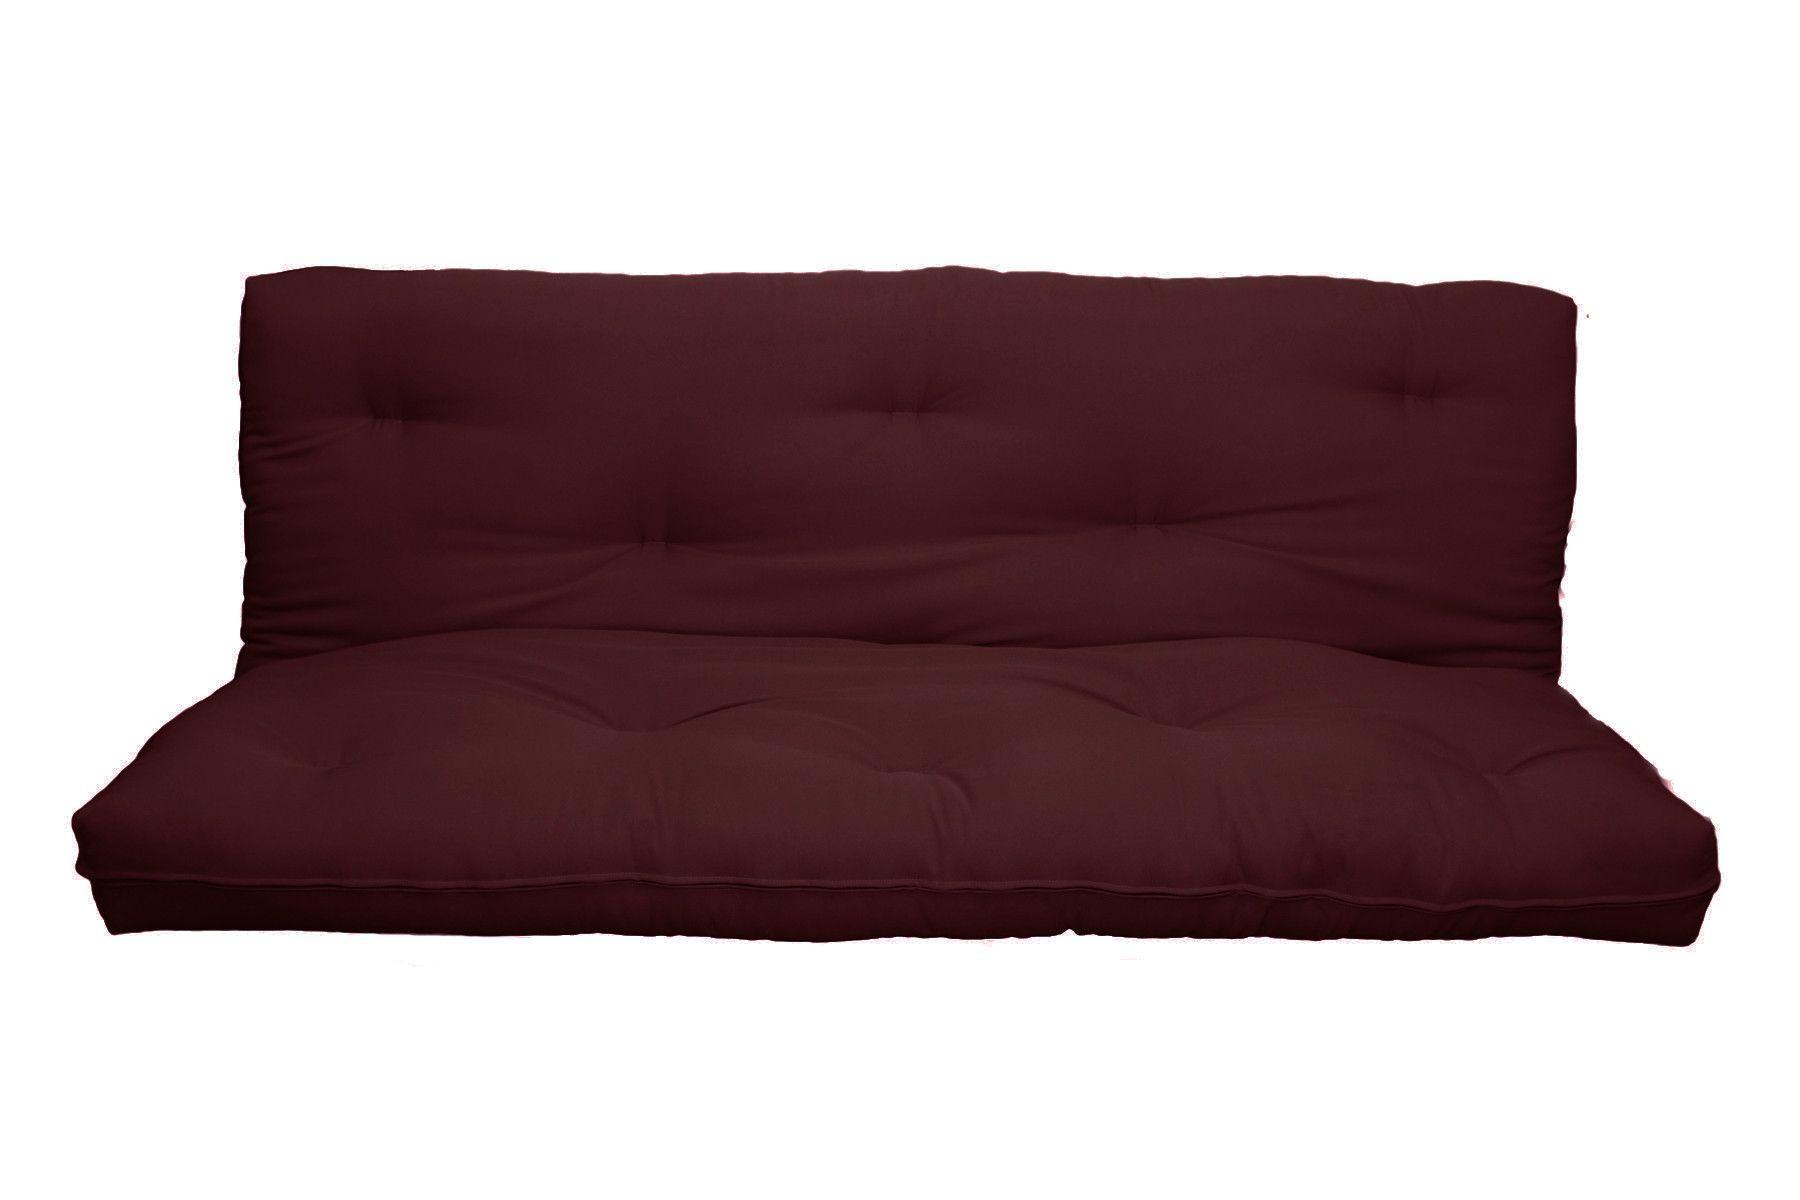 replacement sofa bed mattresses uk fast trailer mattress for futon  roselawnlutheran